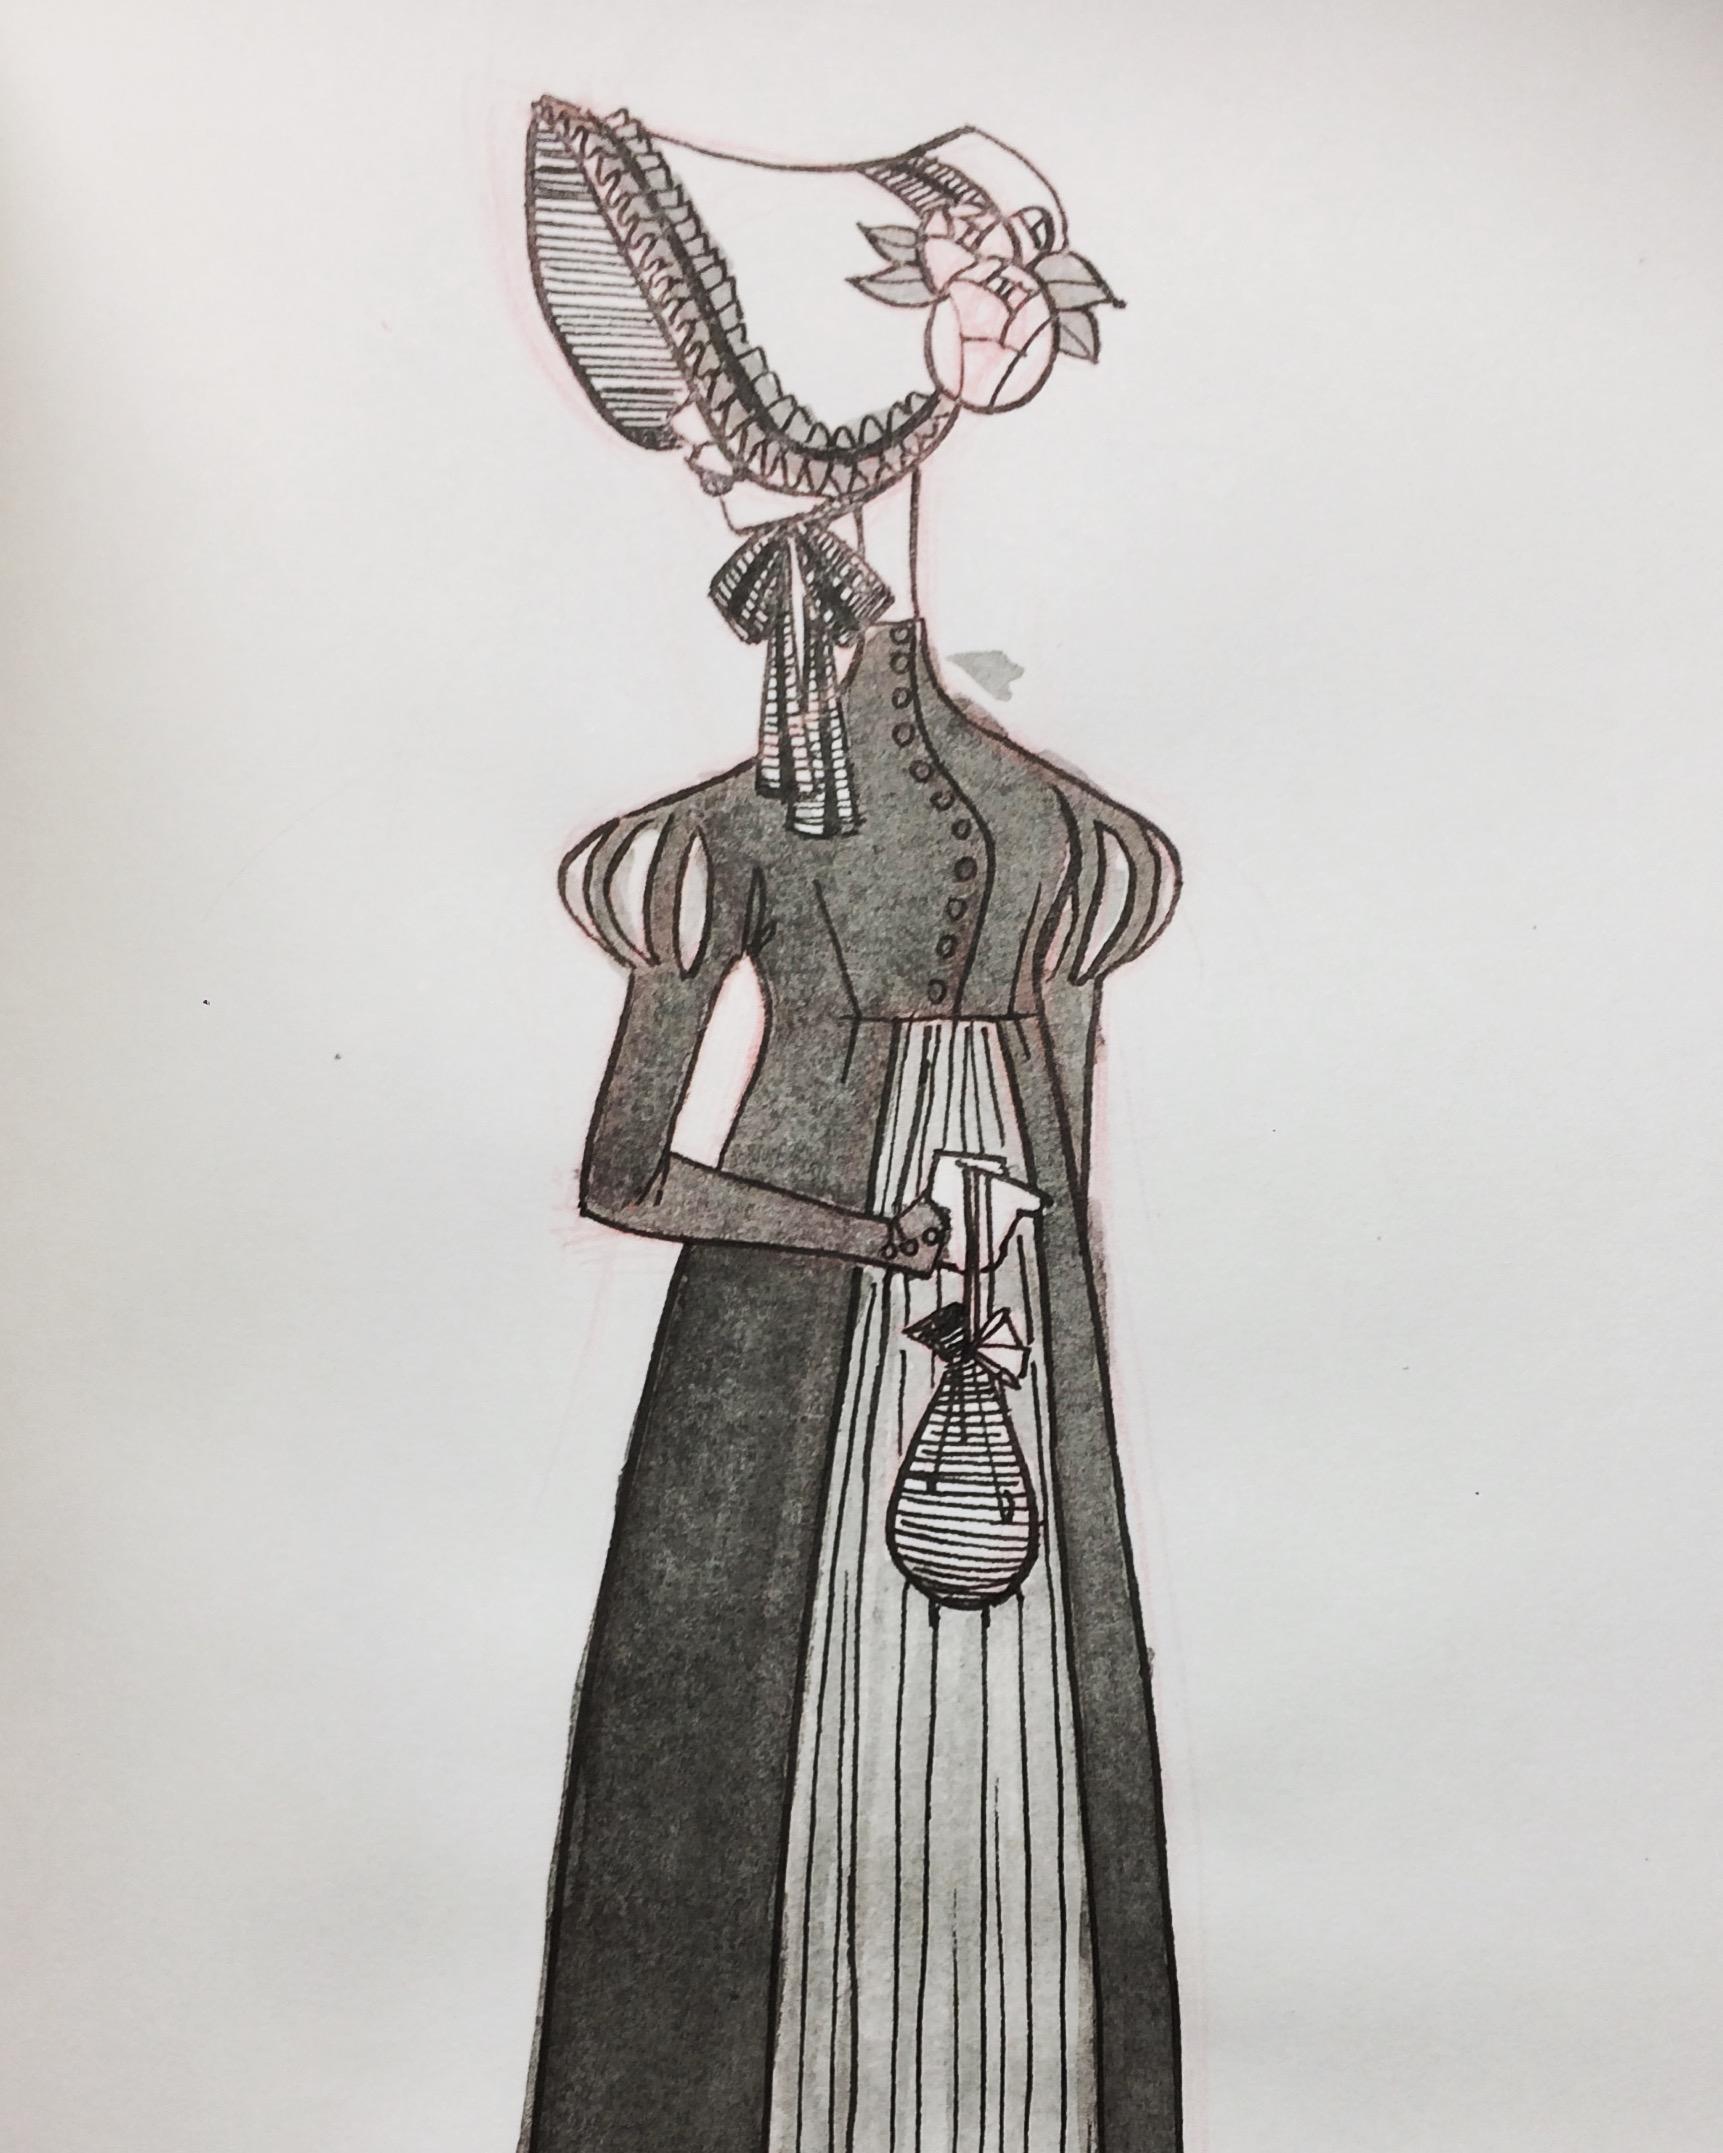 England, 1820s